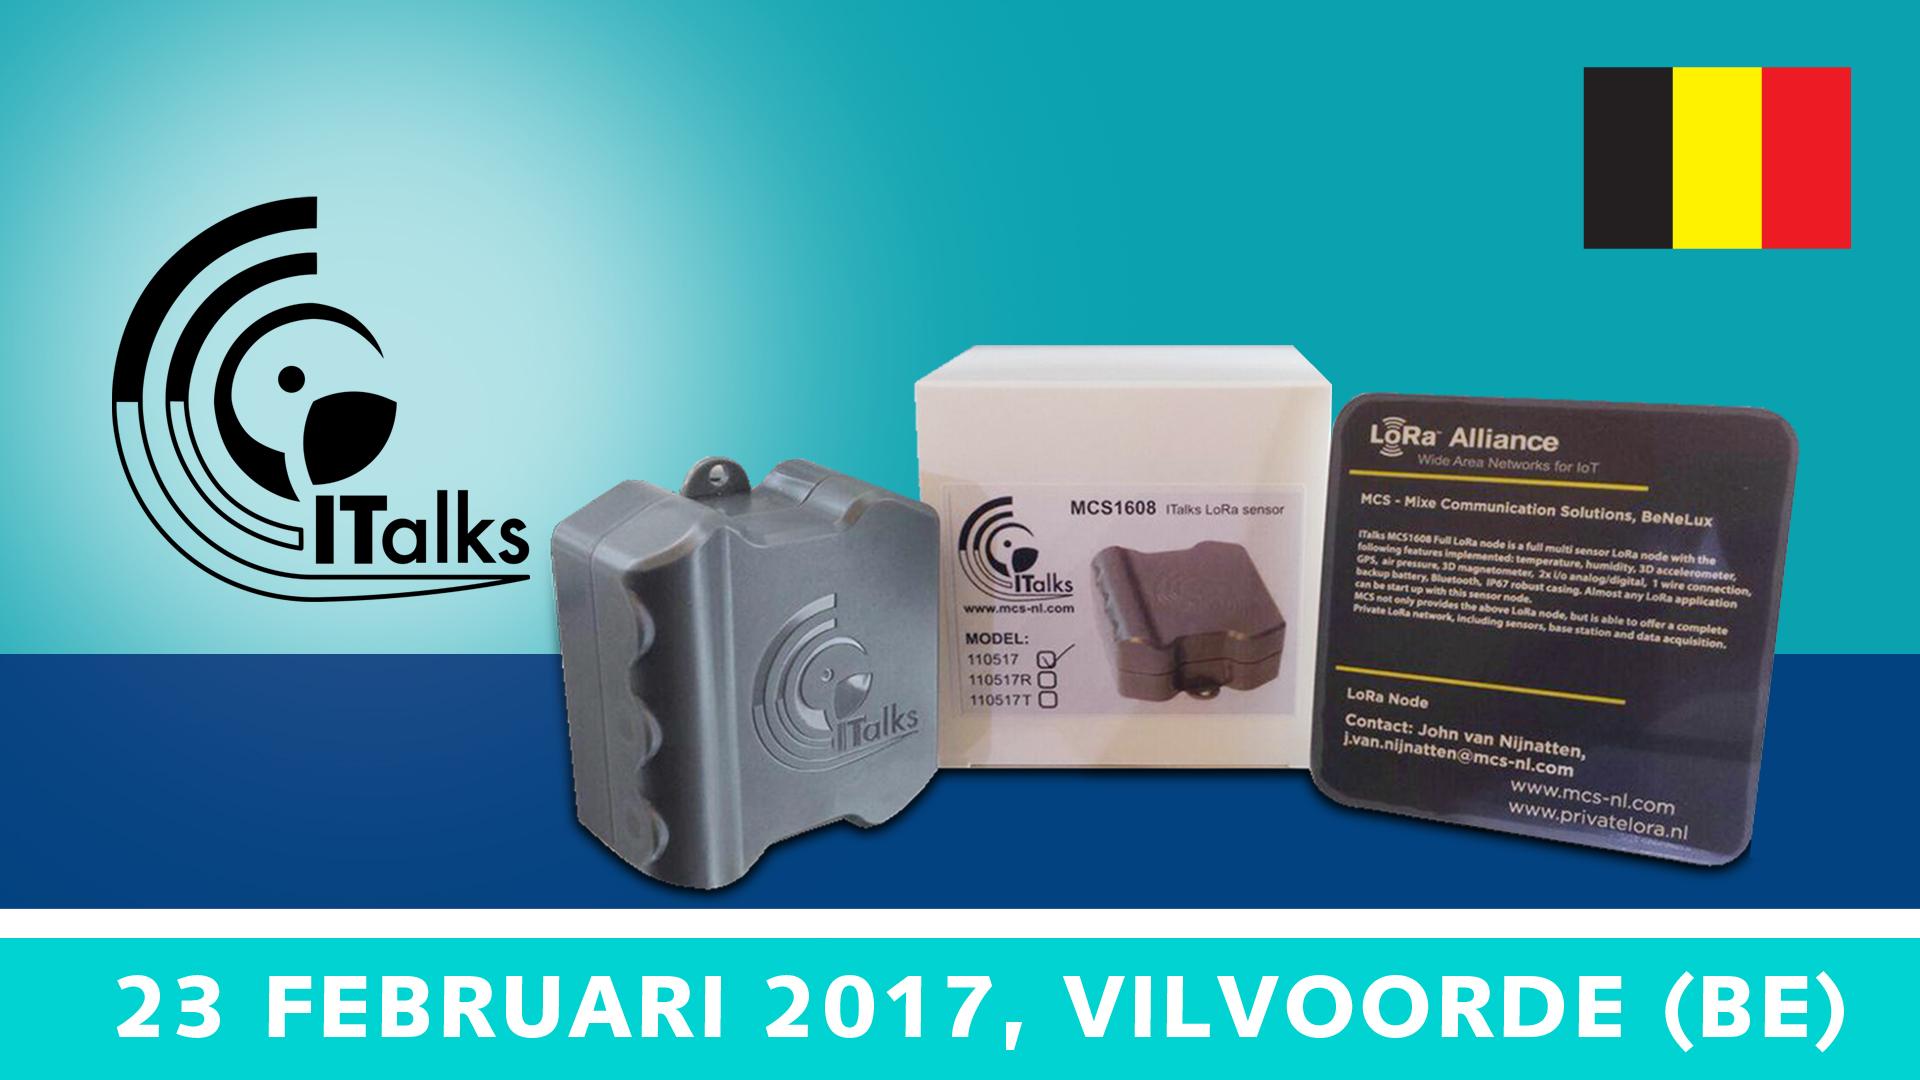 Advanced Workshop ITalks1608 – 23 februari 2017, Vilvoorde   Pushing the limits of communication technology   MCS